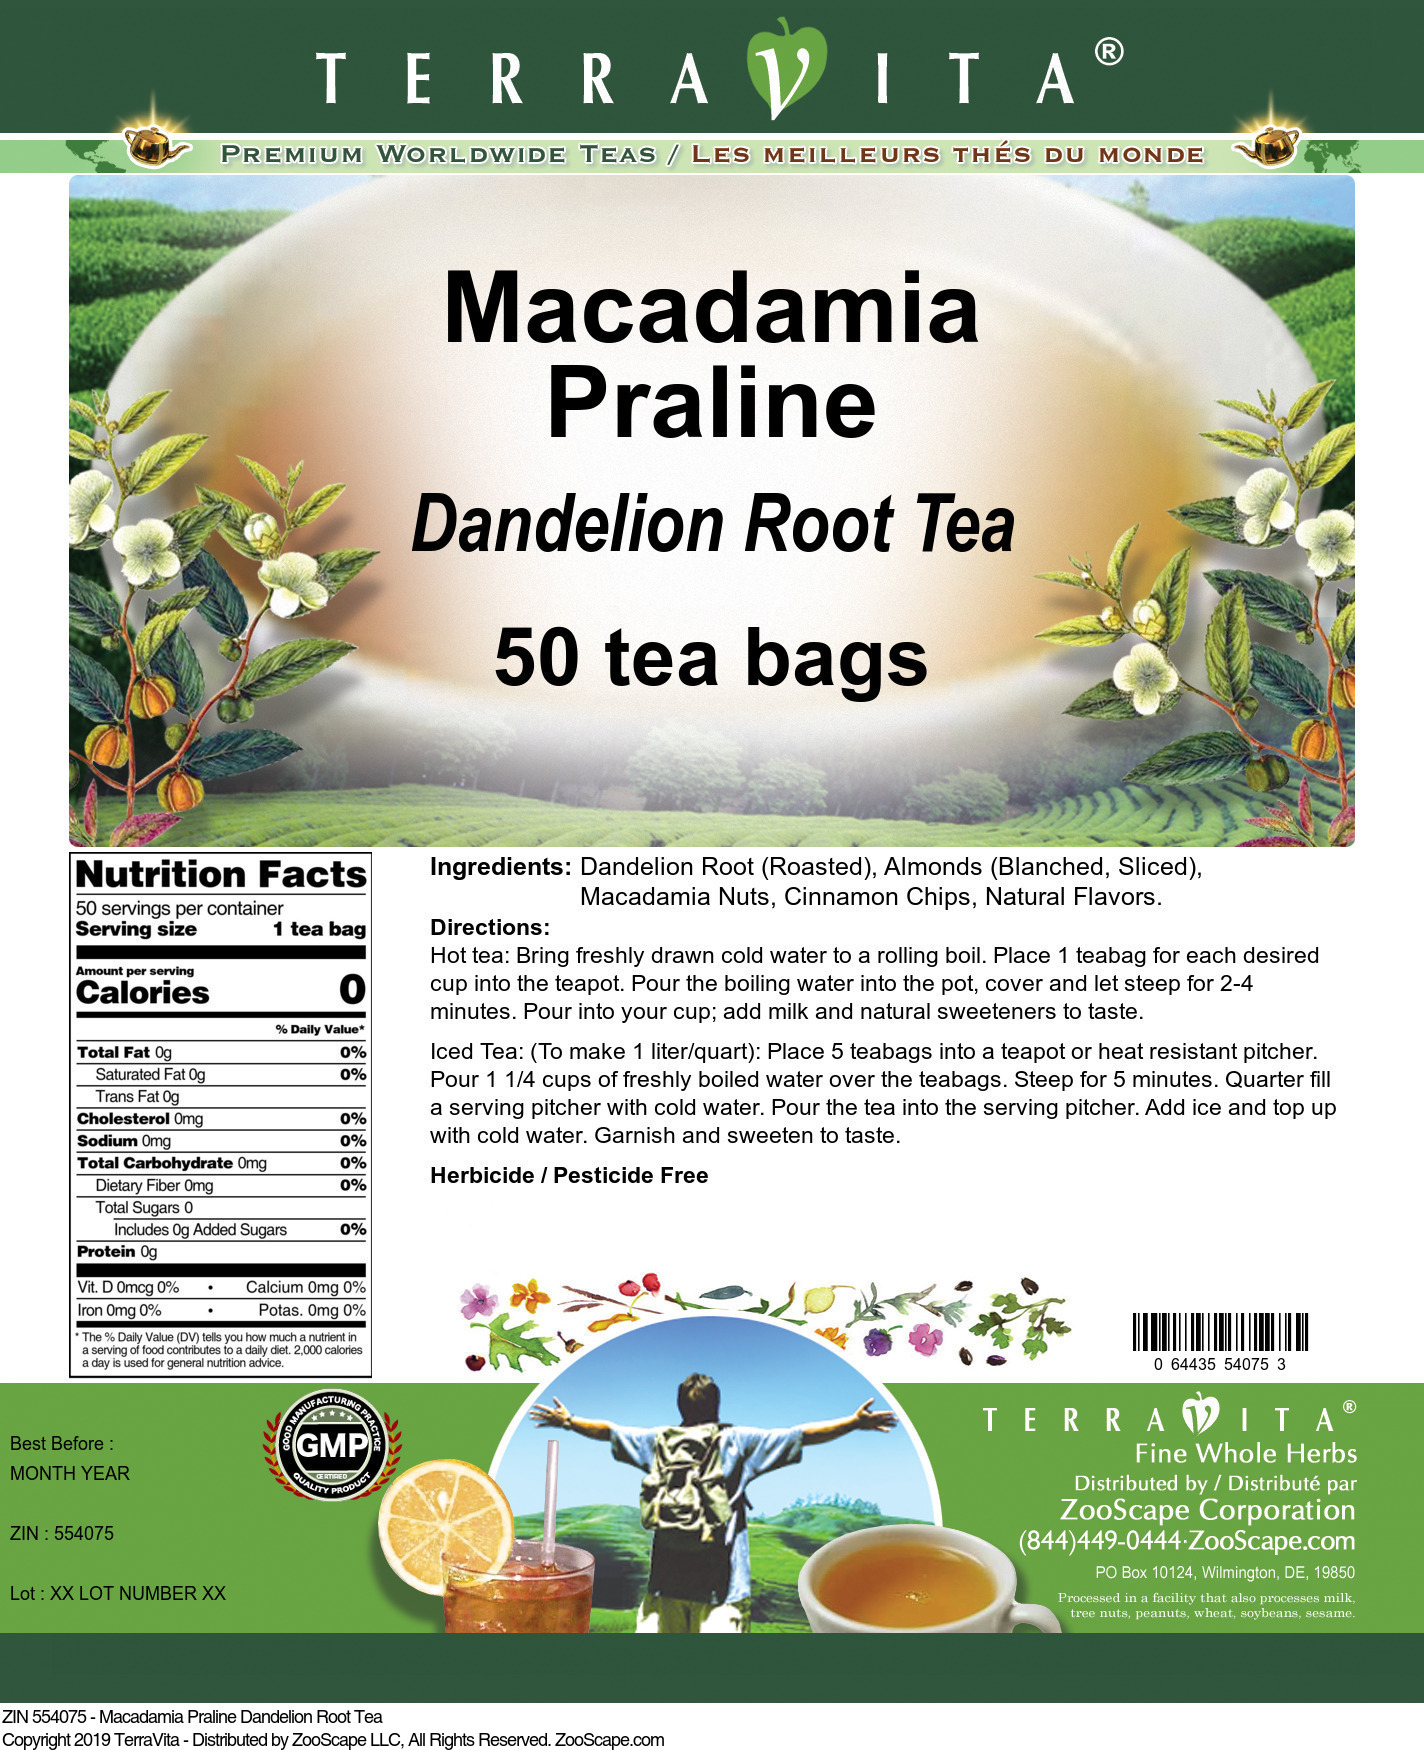 Macadamia Praline Dandelion Root